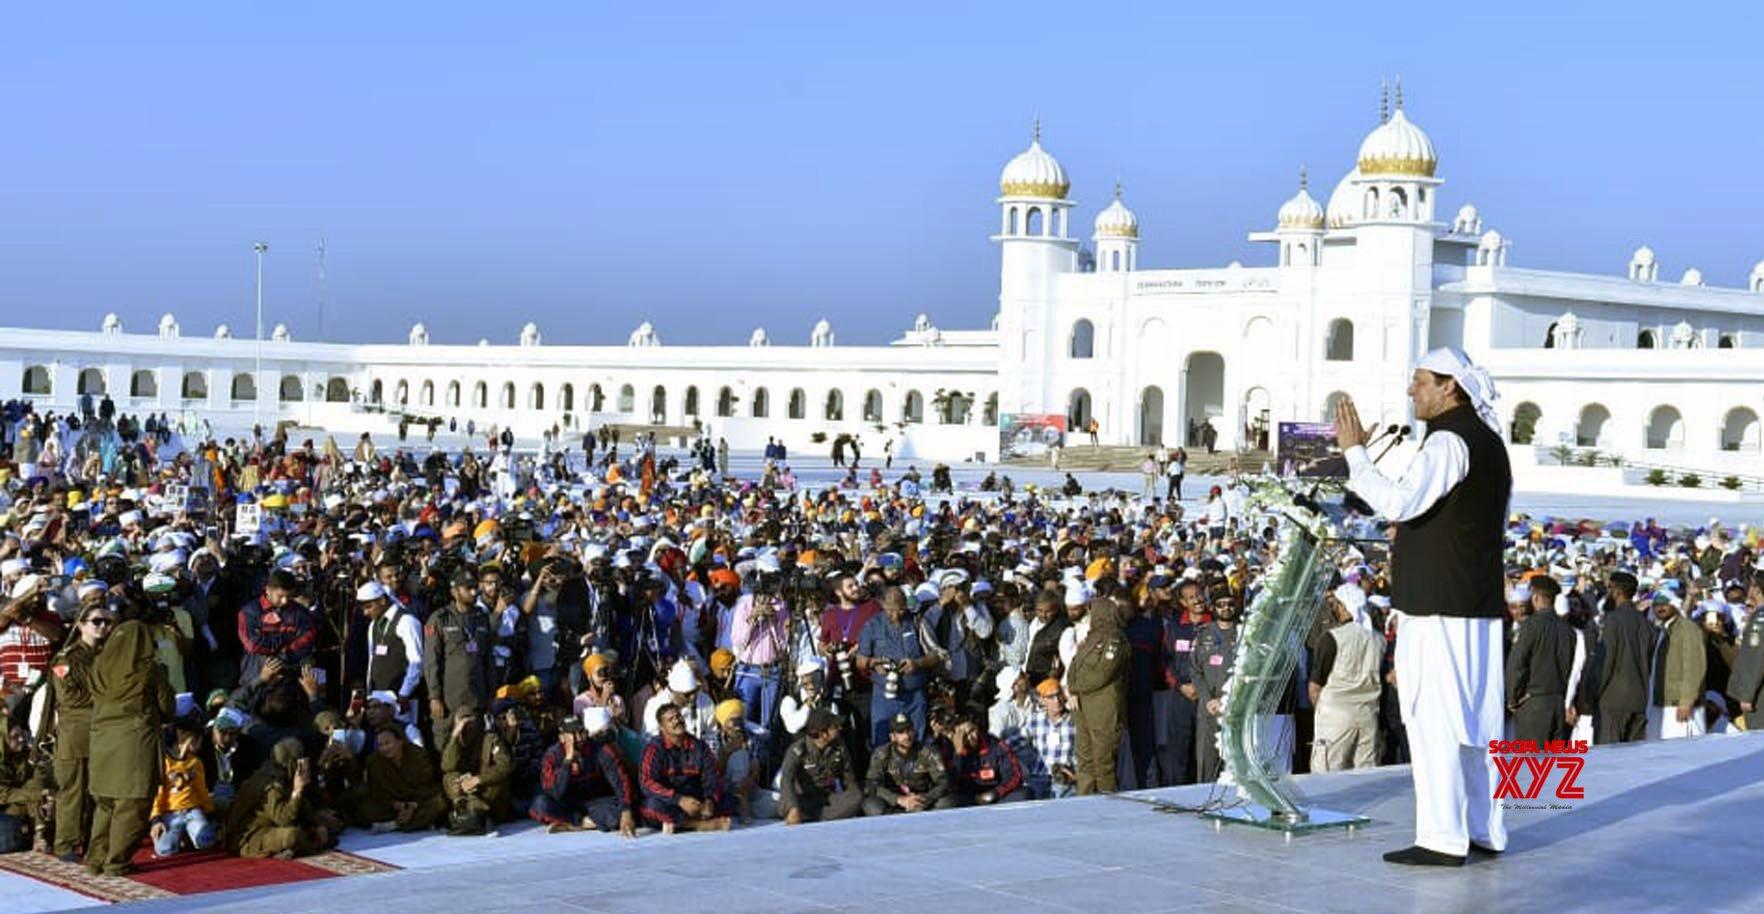 PAKISTAN - NAROWAL - CORRIDOR - INDIAN SIKH PILGRIMS - INAUGURATION #Gallery